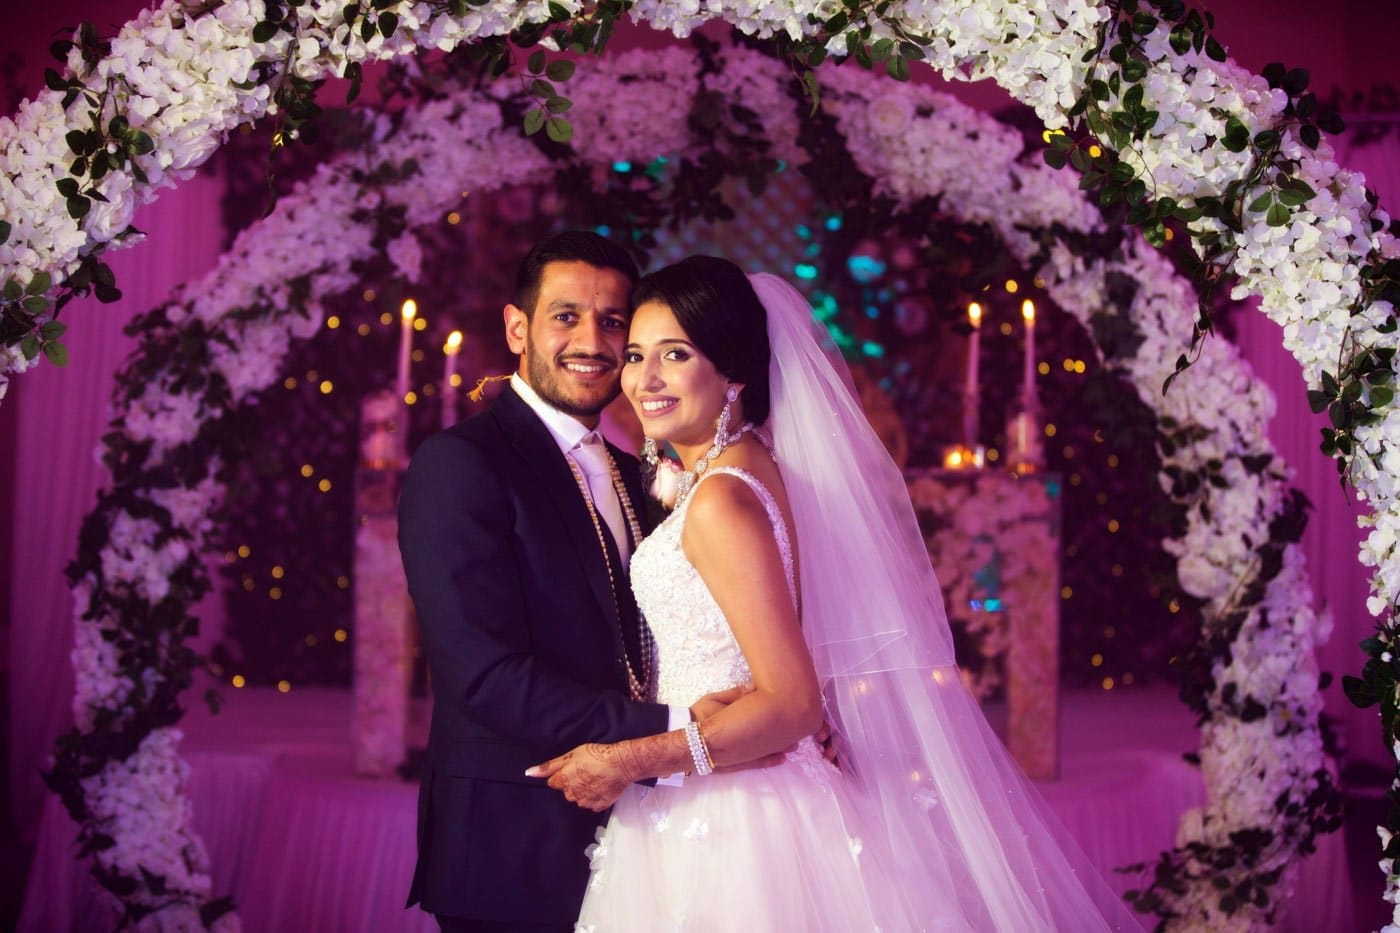 wedding-photography-and-videography-at-Manor-Grove-__-Viney-&-Sundeep